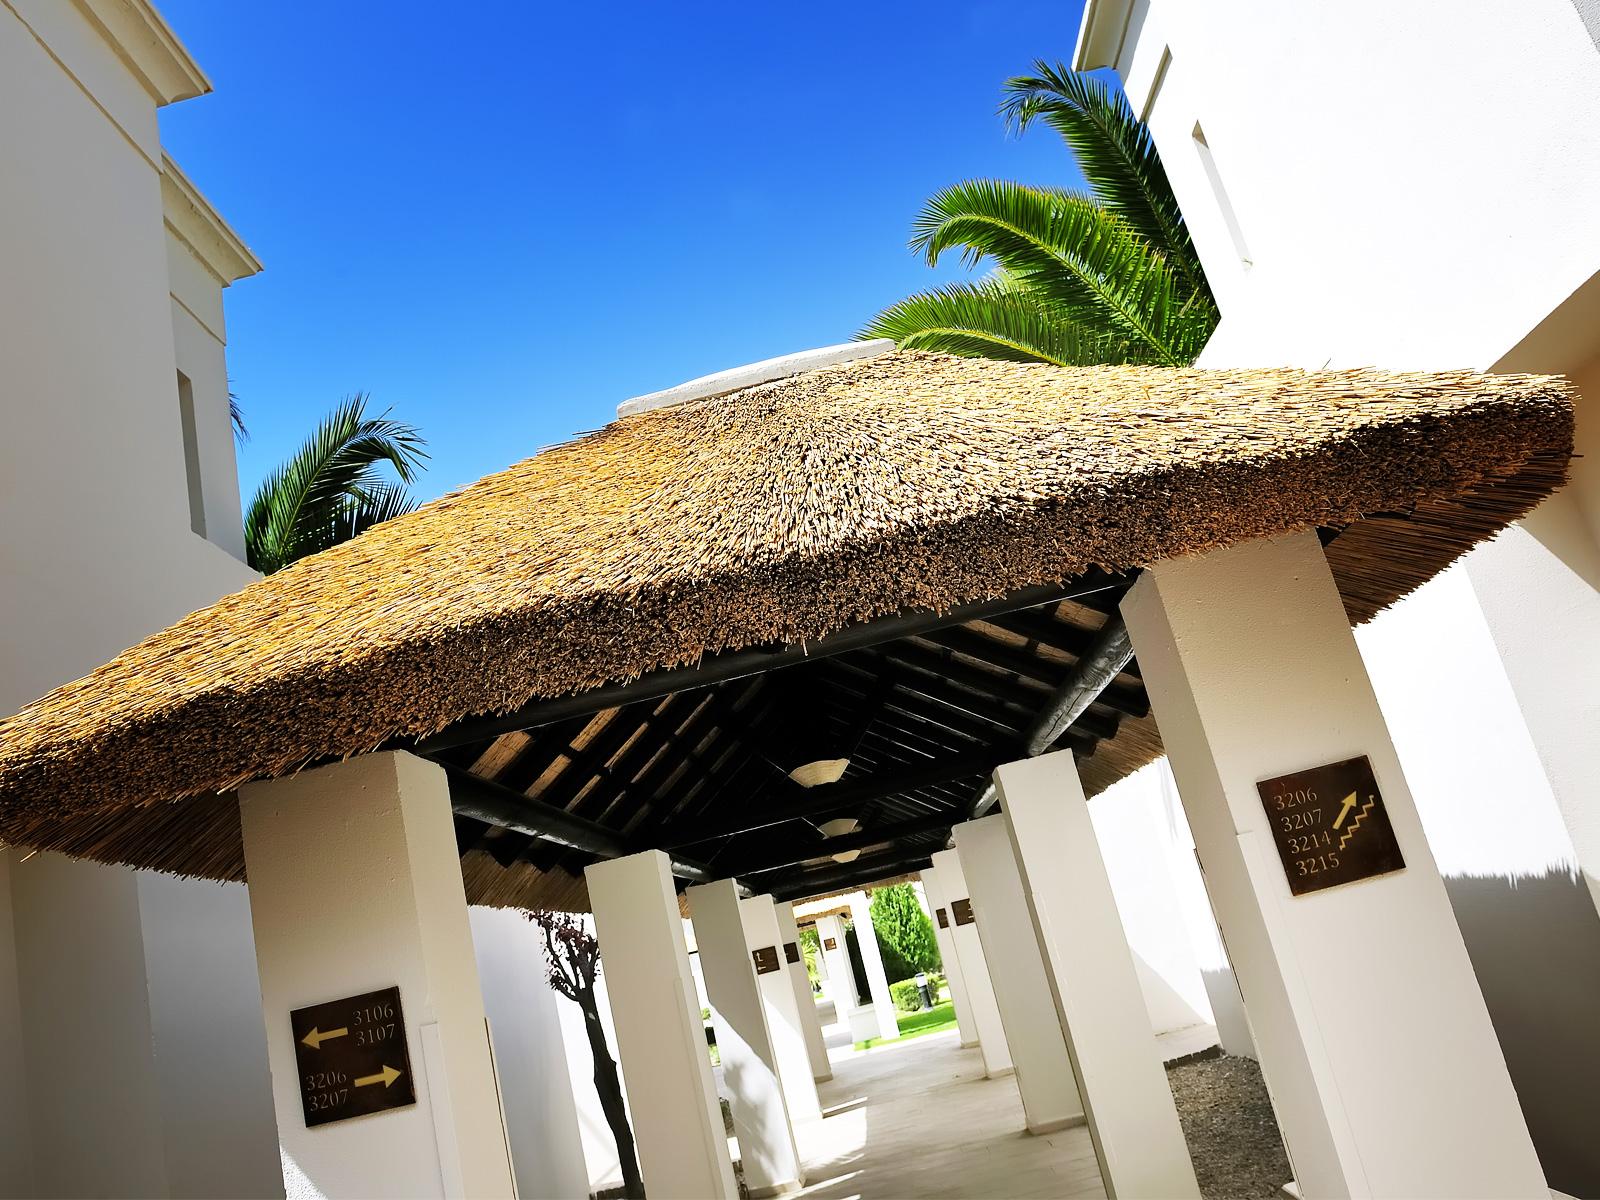 Esteriore-Hoteles Vincci. Hotel Vincci Costa Golf Cadice